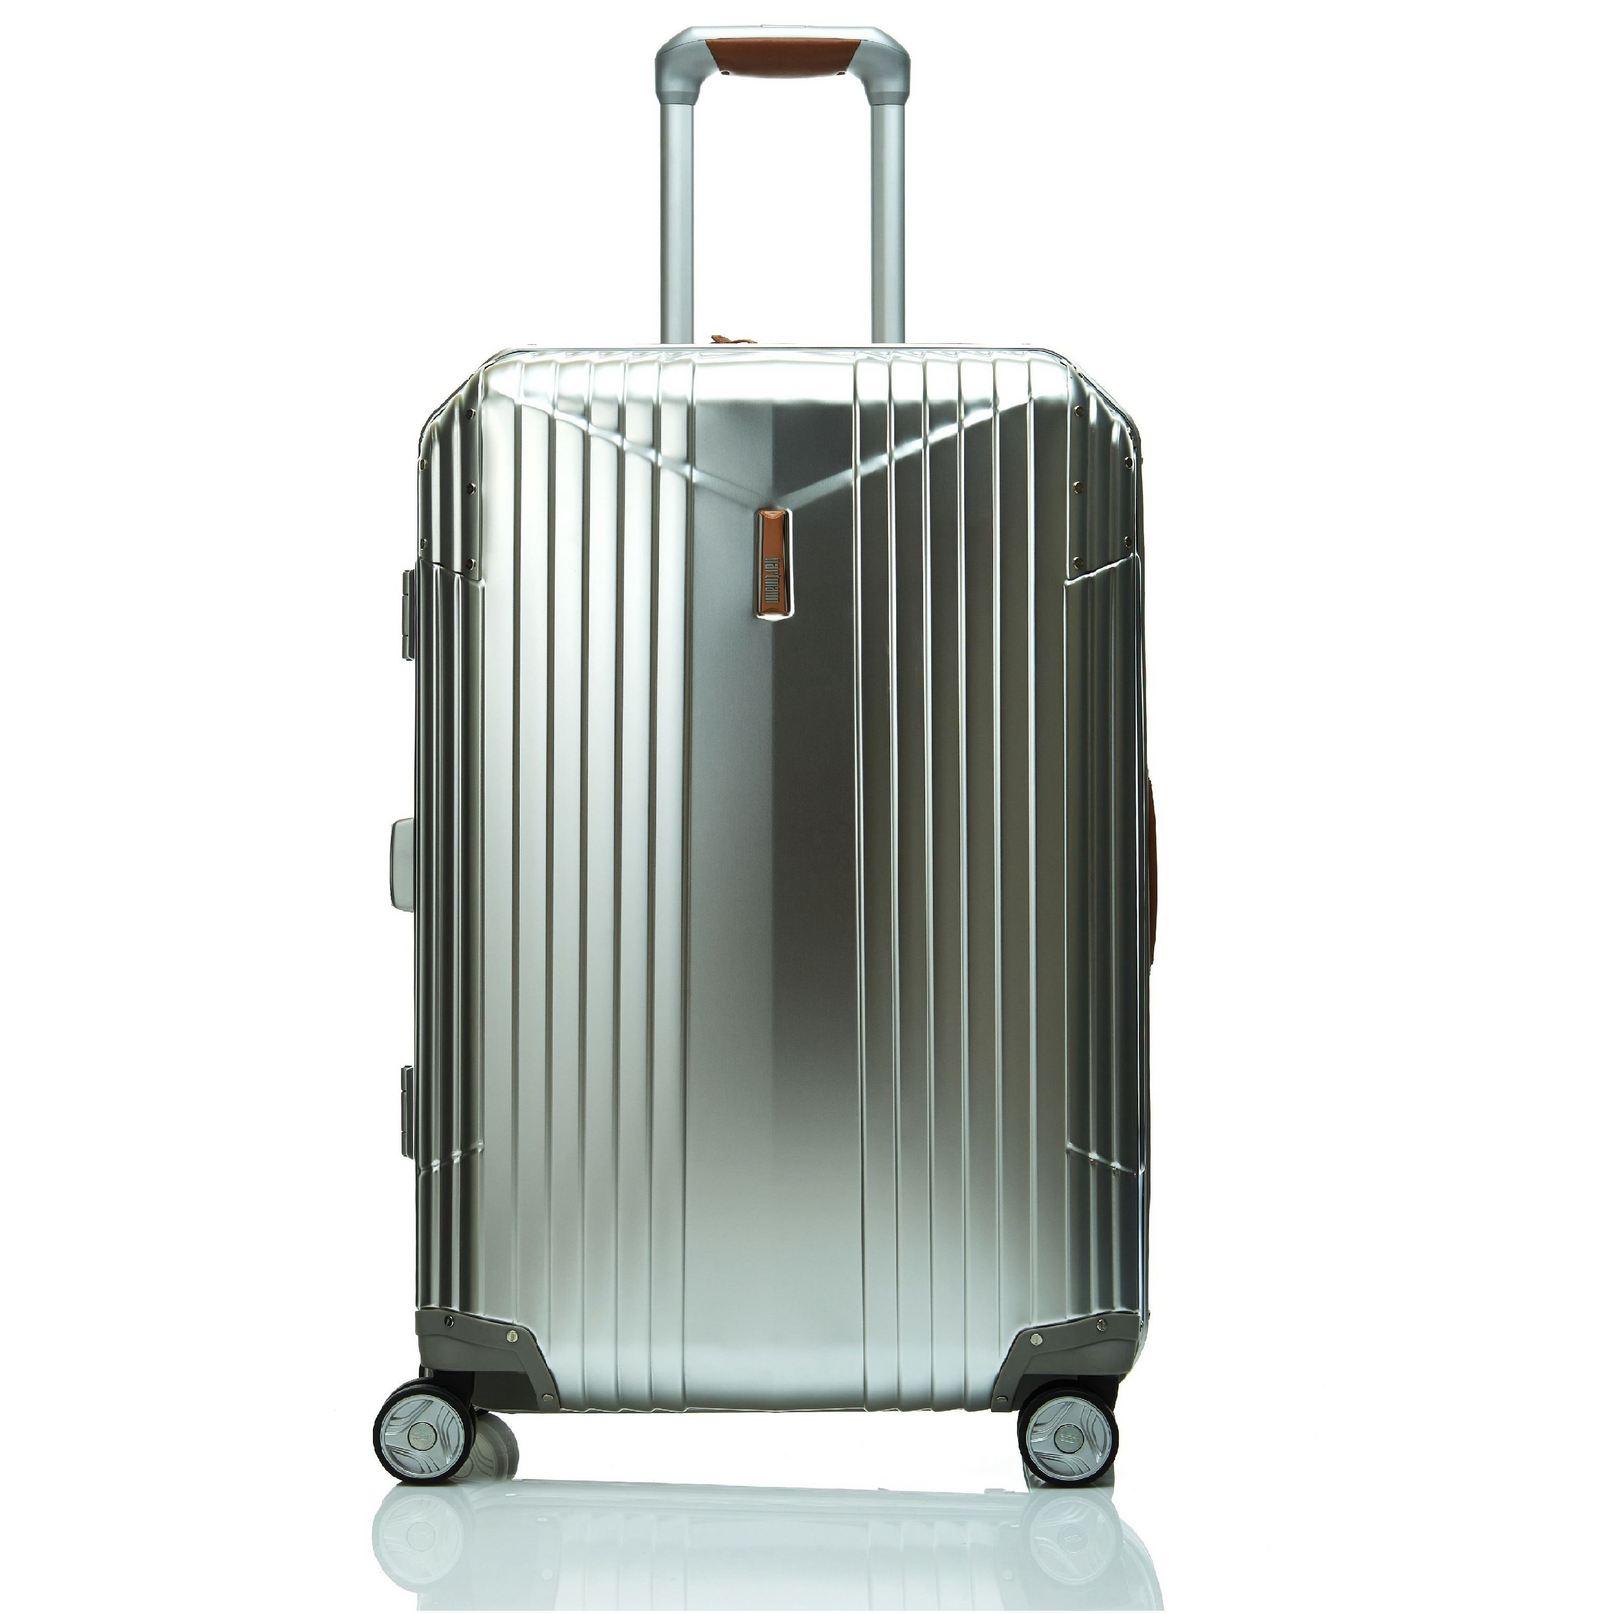 Samsonite新秀 Hartmann品牌四輪拉桿箱時尚旅行箱定制銀色20寸G9508001